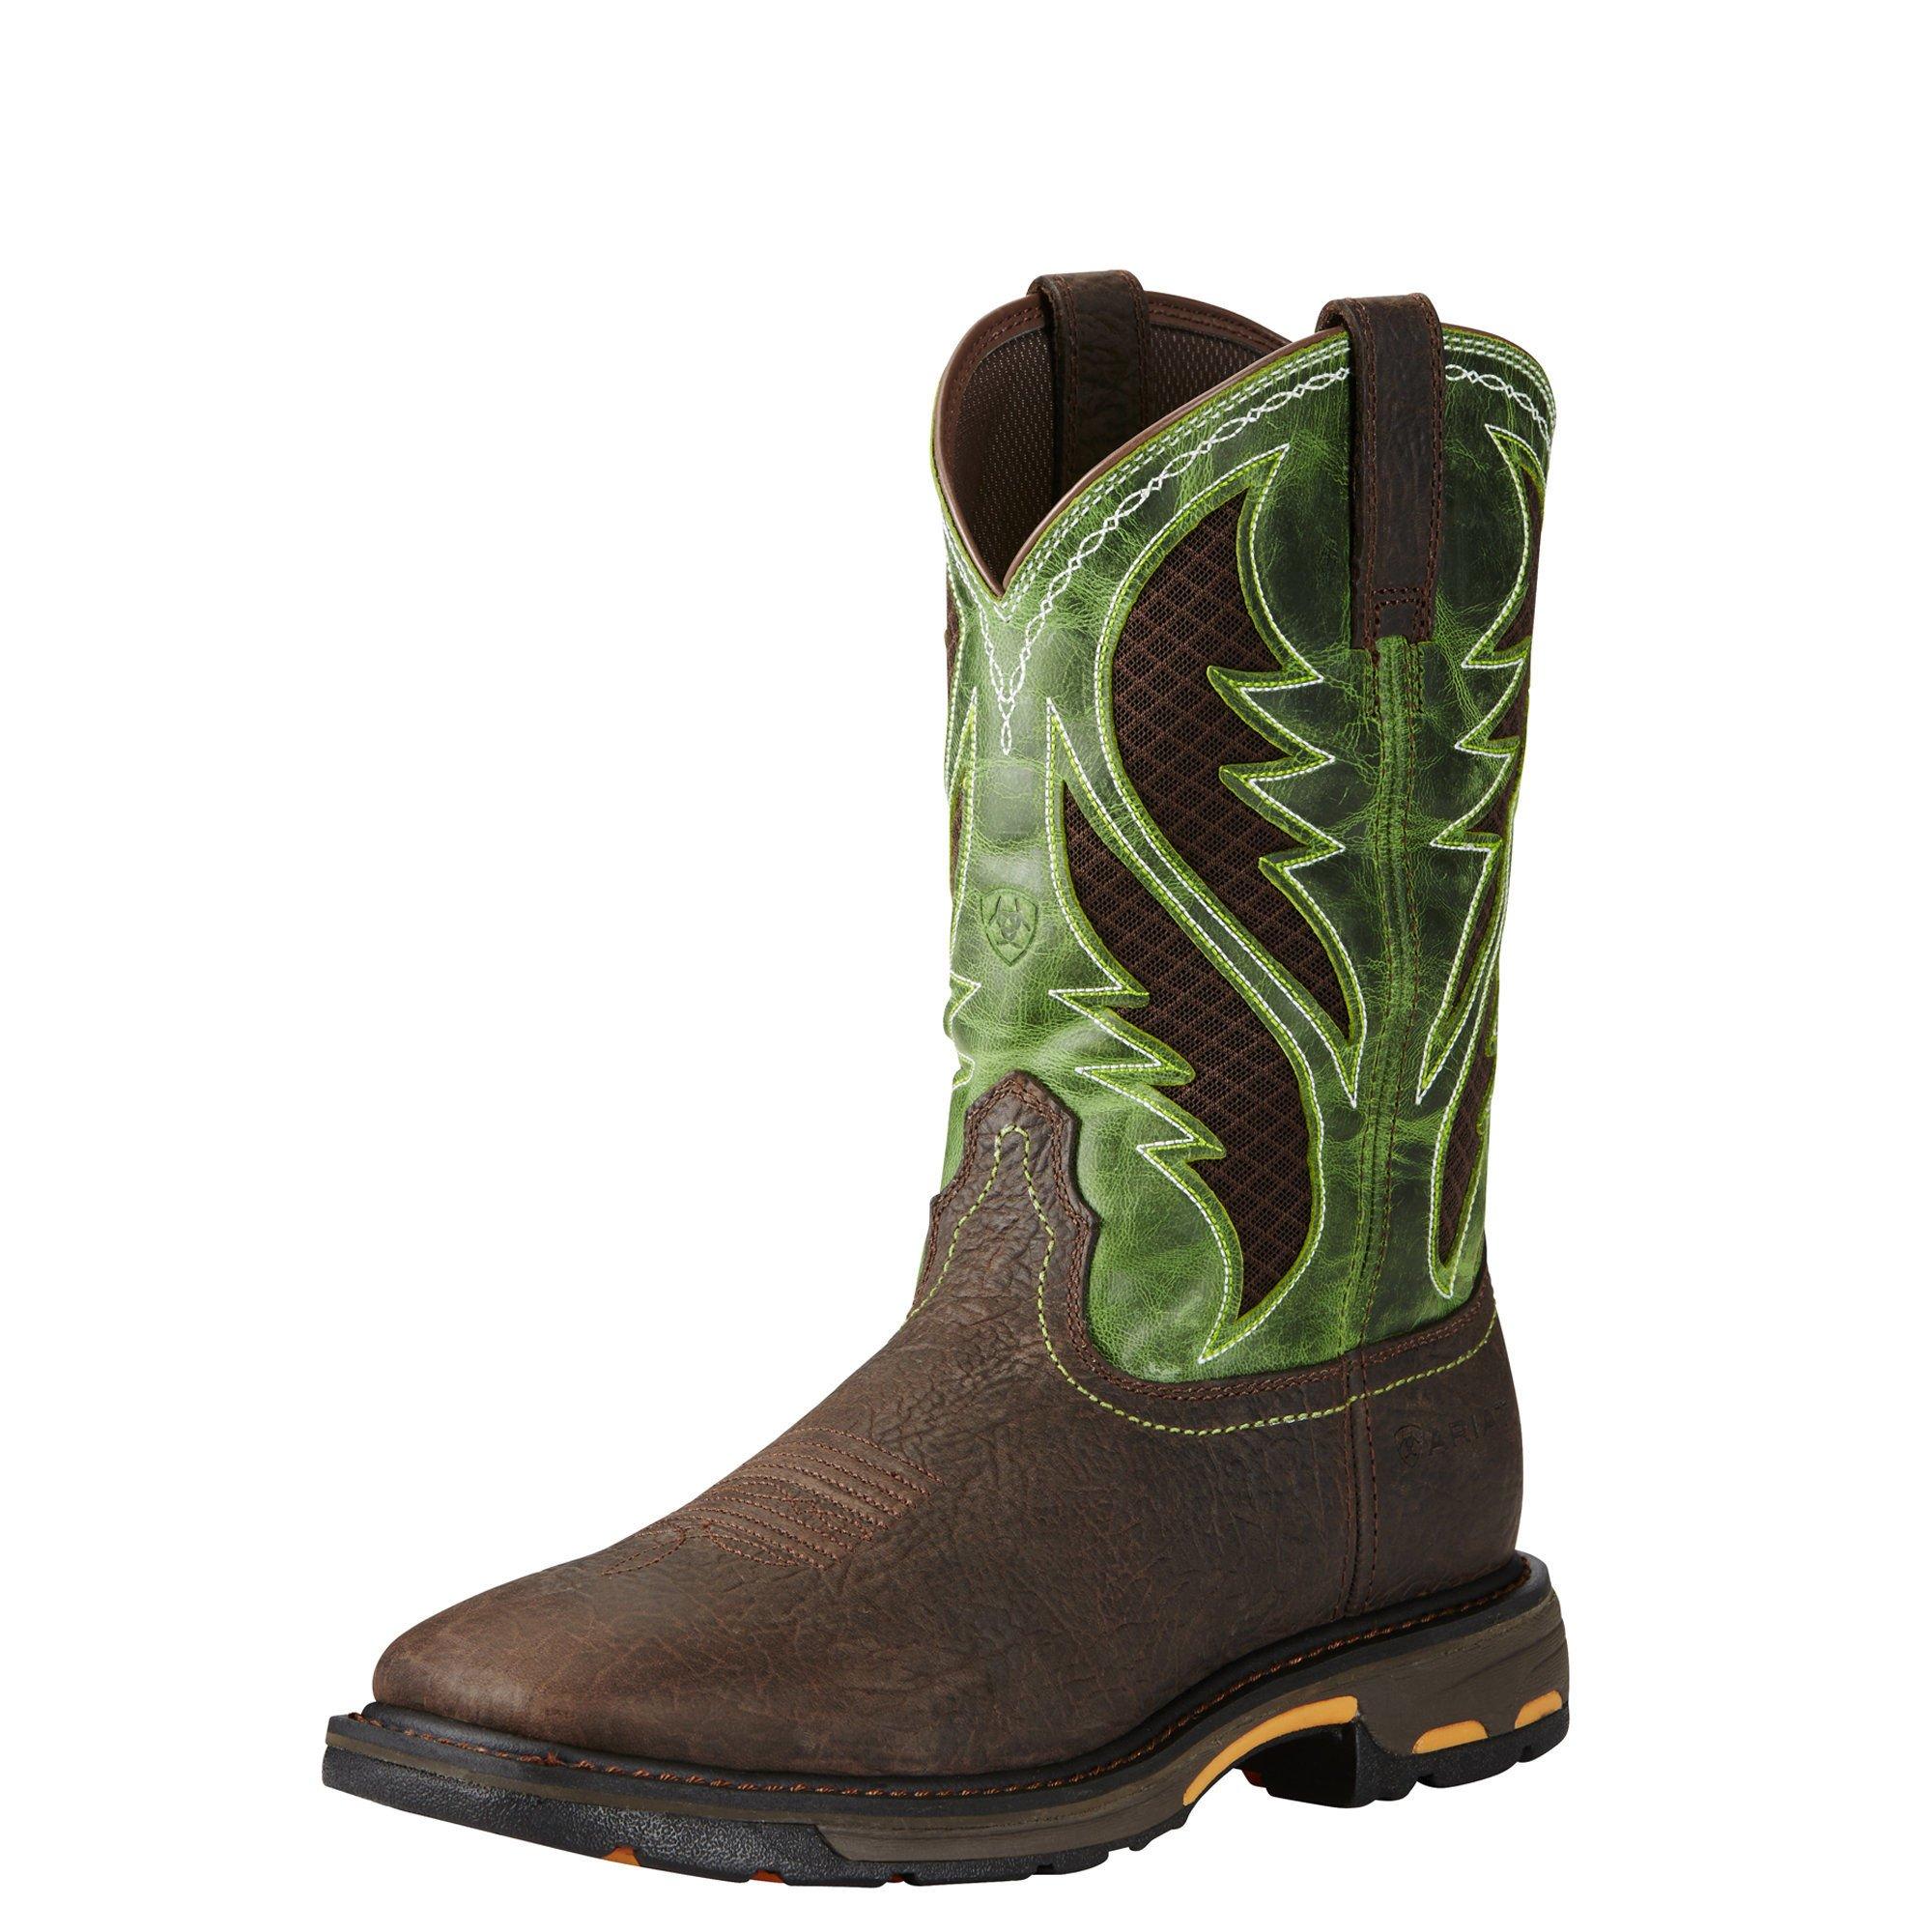 Ariat Work Men's Workhog Venttek Work Boot, Bruin Brown/Grass Green, 12 D US